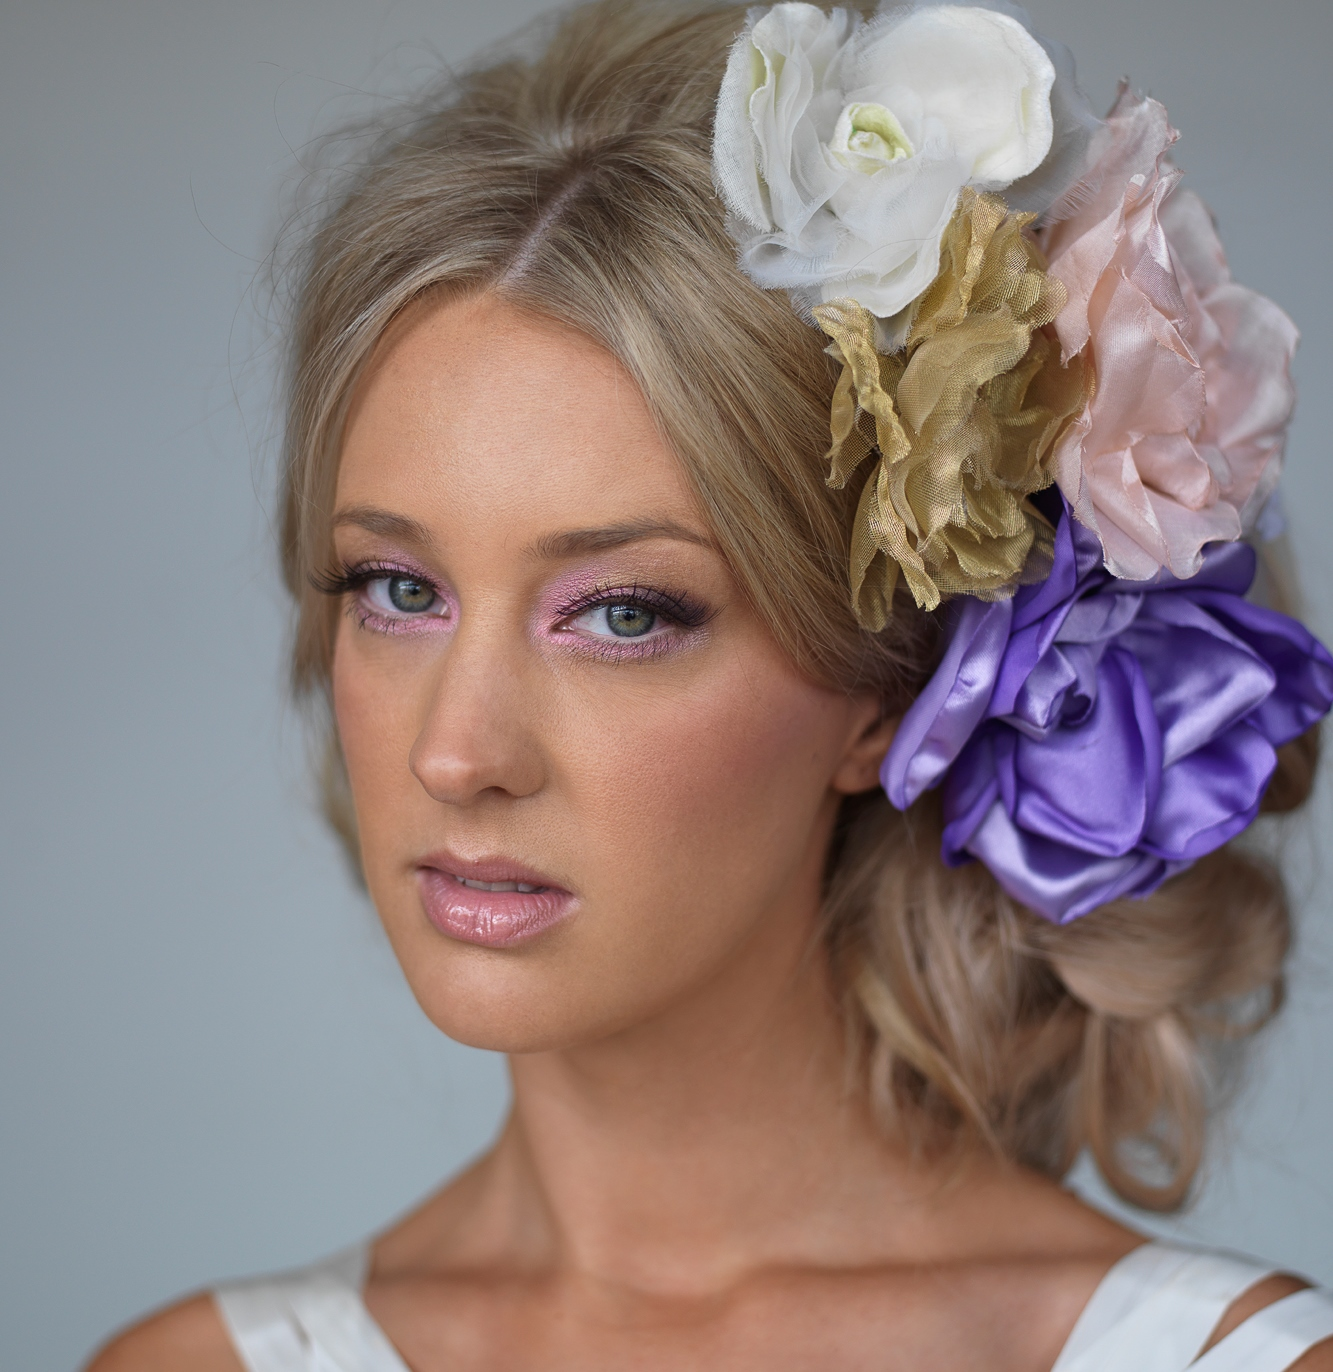 Hair & Makeup Courses Beginners Makeup Course by Joanna Blair School of Makeup